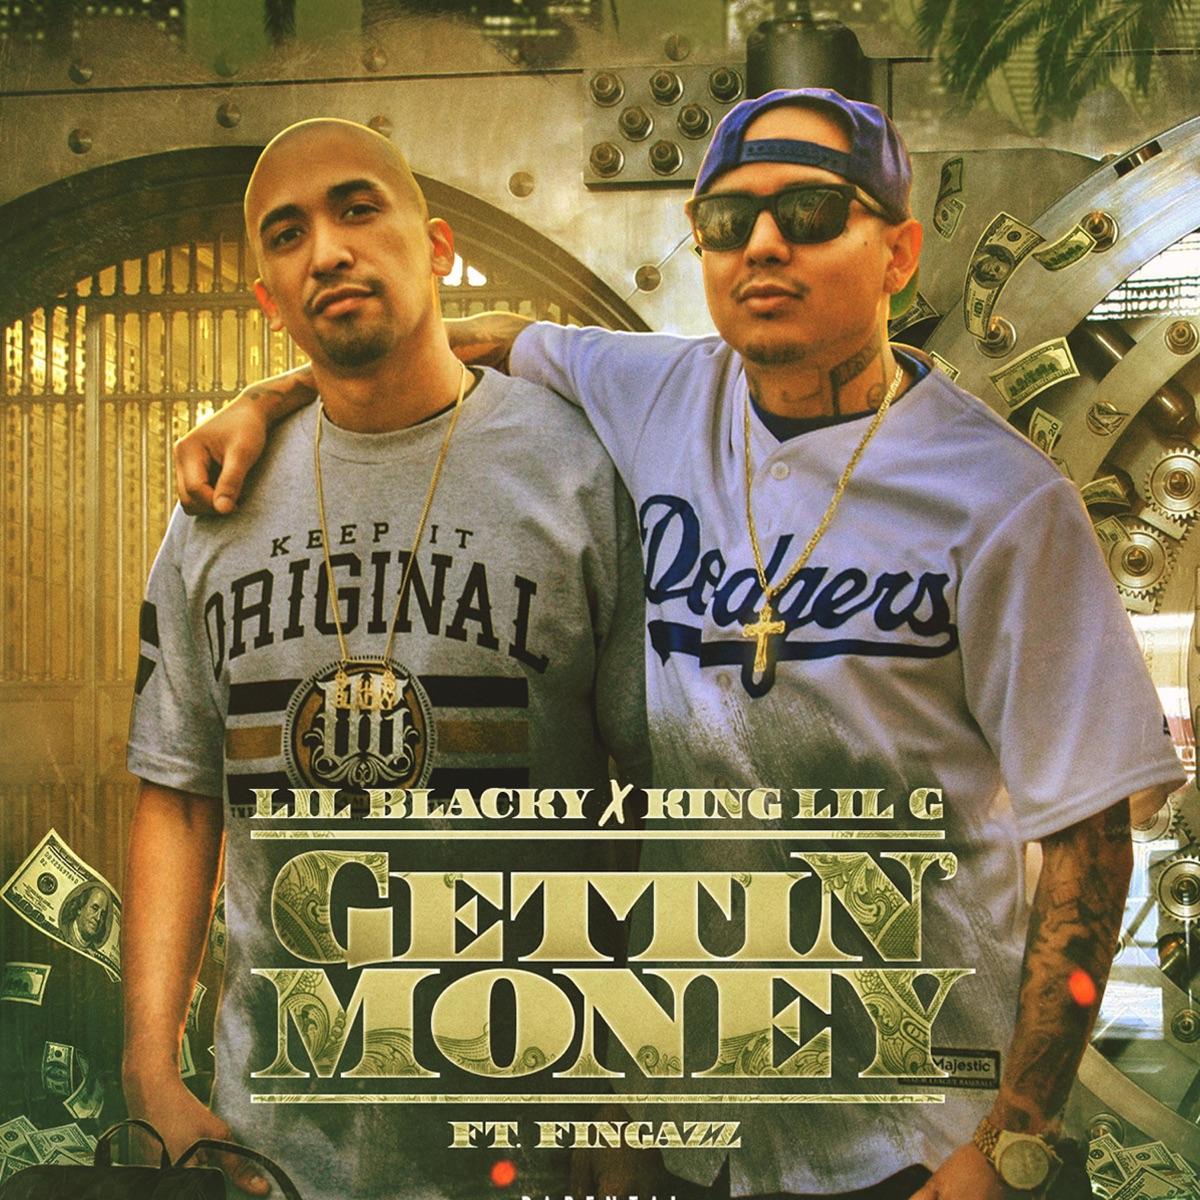 Gettin' Money Album Cover by Lil Blacky